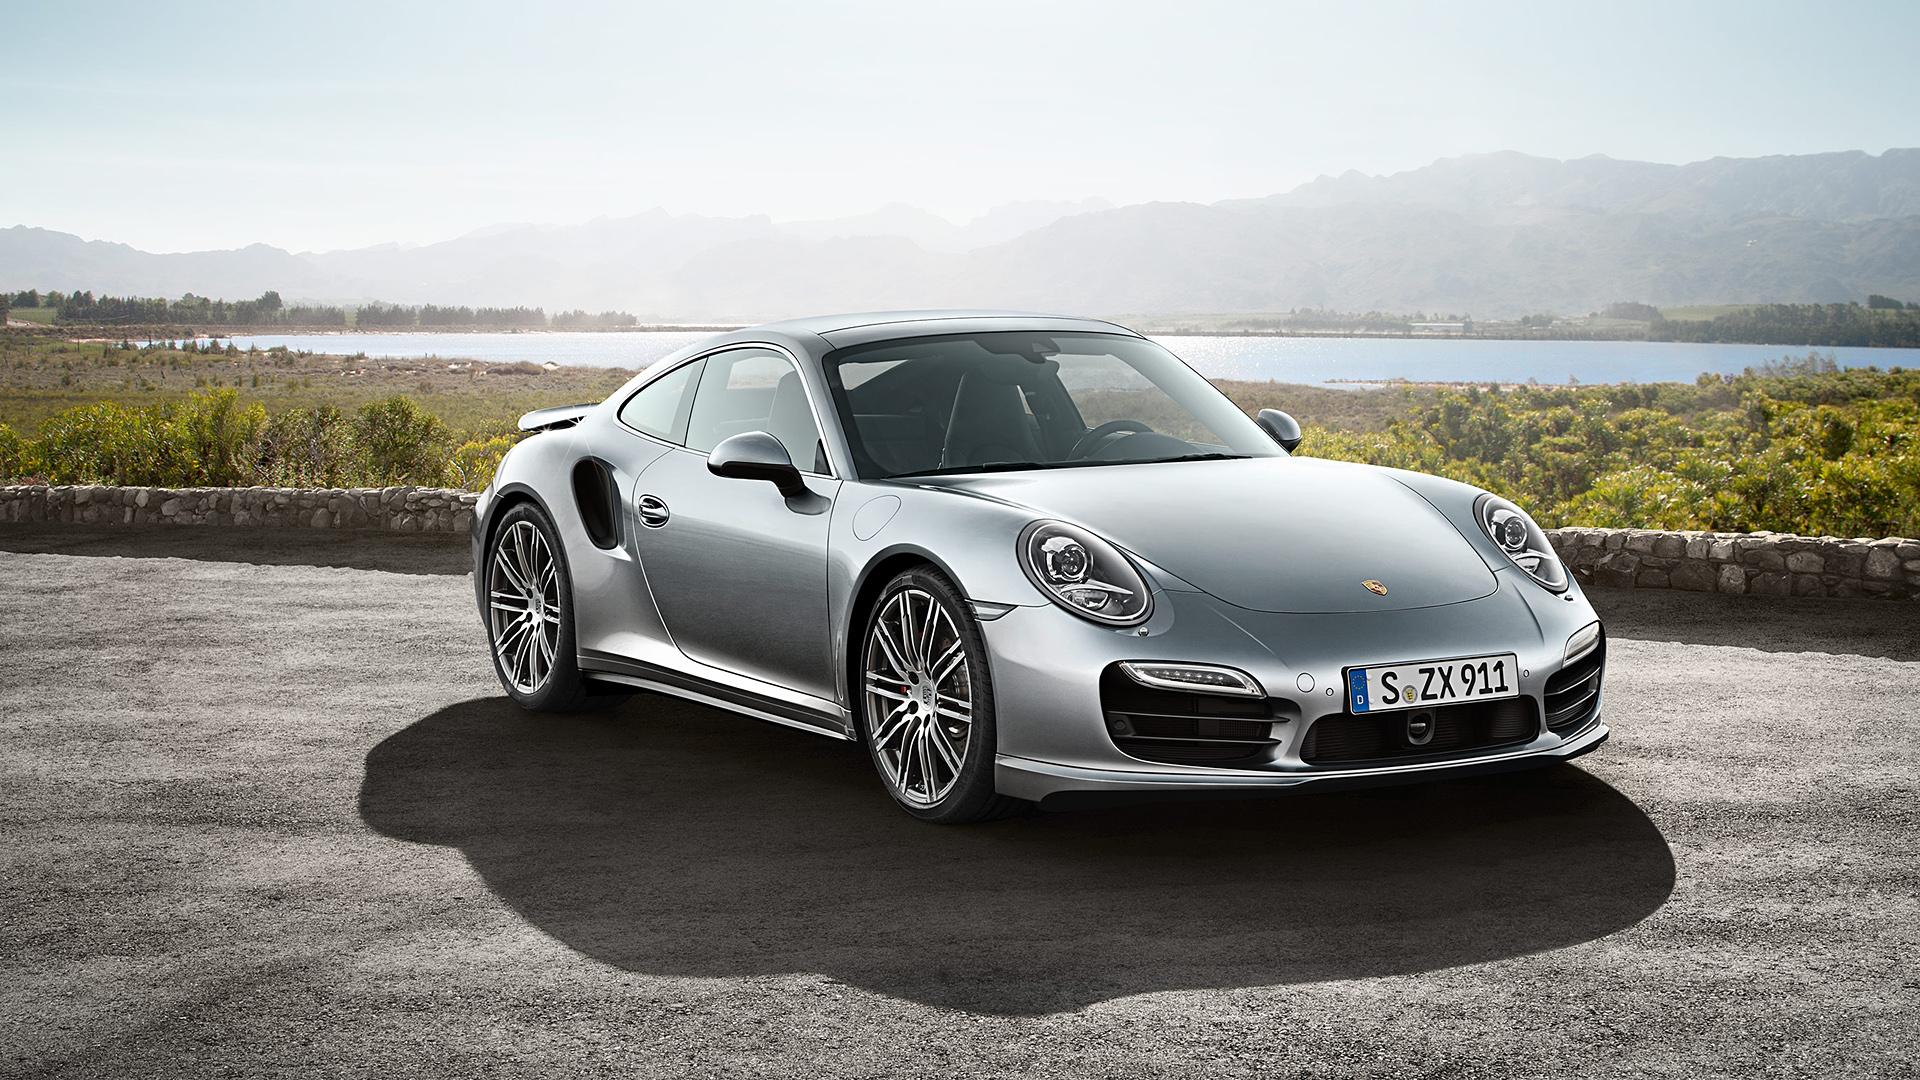 2014 Porsche 911 Turbo Wallpaper   HD 1920x1080